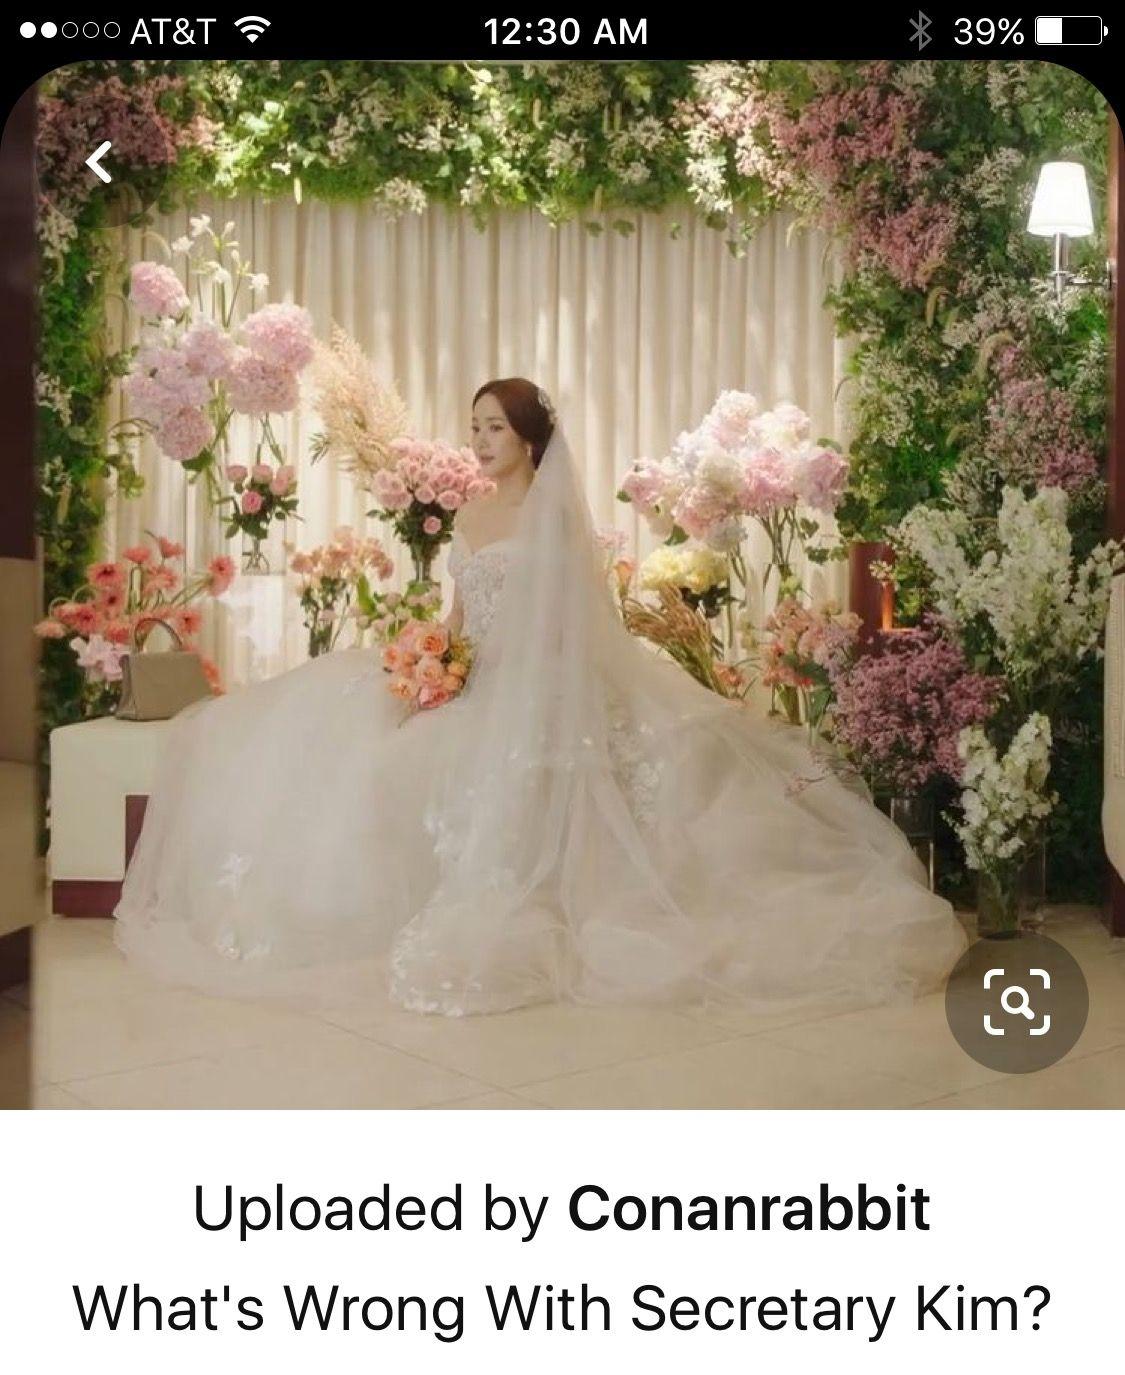 Pin By Eve Barna On Lee Minh Ho Hyun Bin J Chang Wook Korean Dramas In 2020 Young Wedding Wedding Korean Wedding